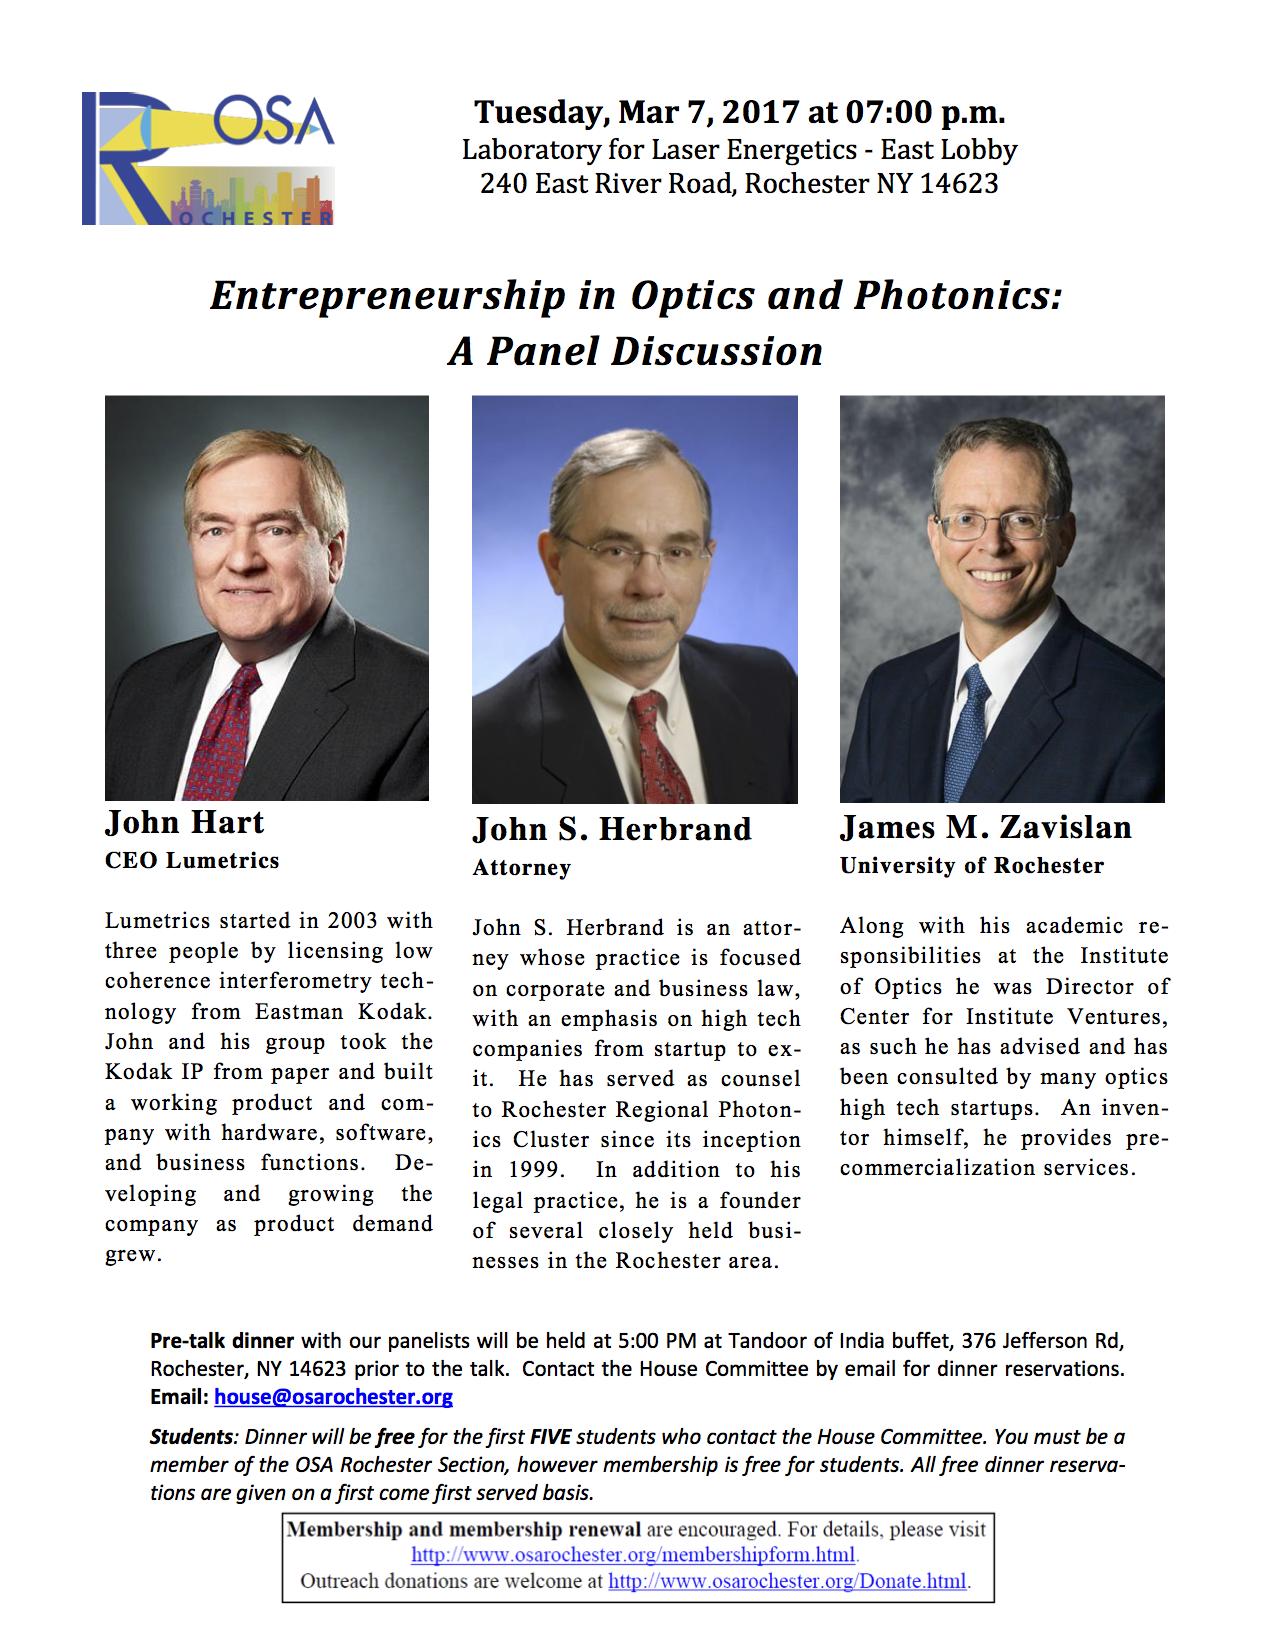 2017-03-07_optics_entrepreneurship_panel